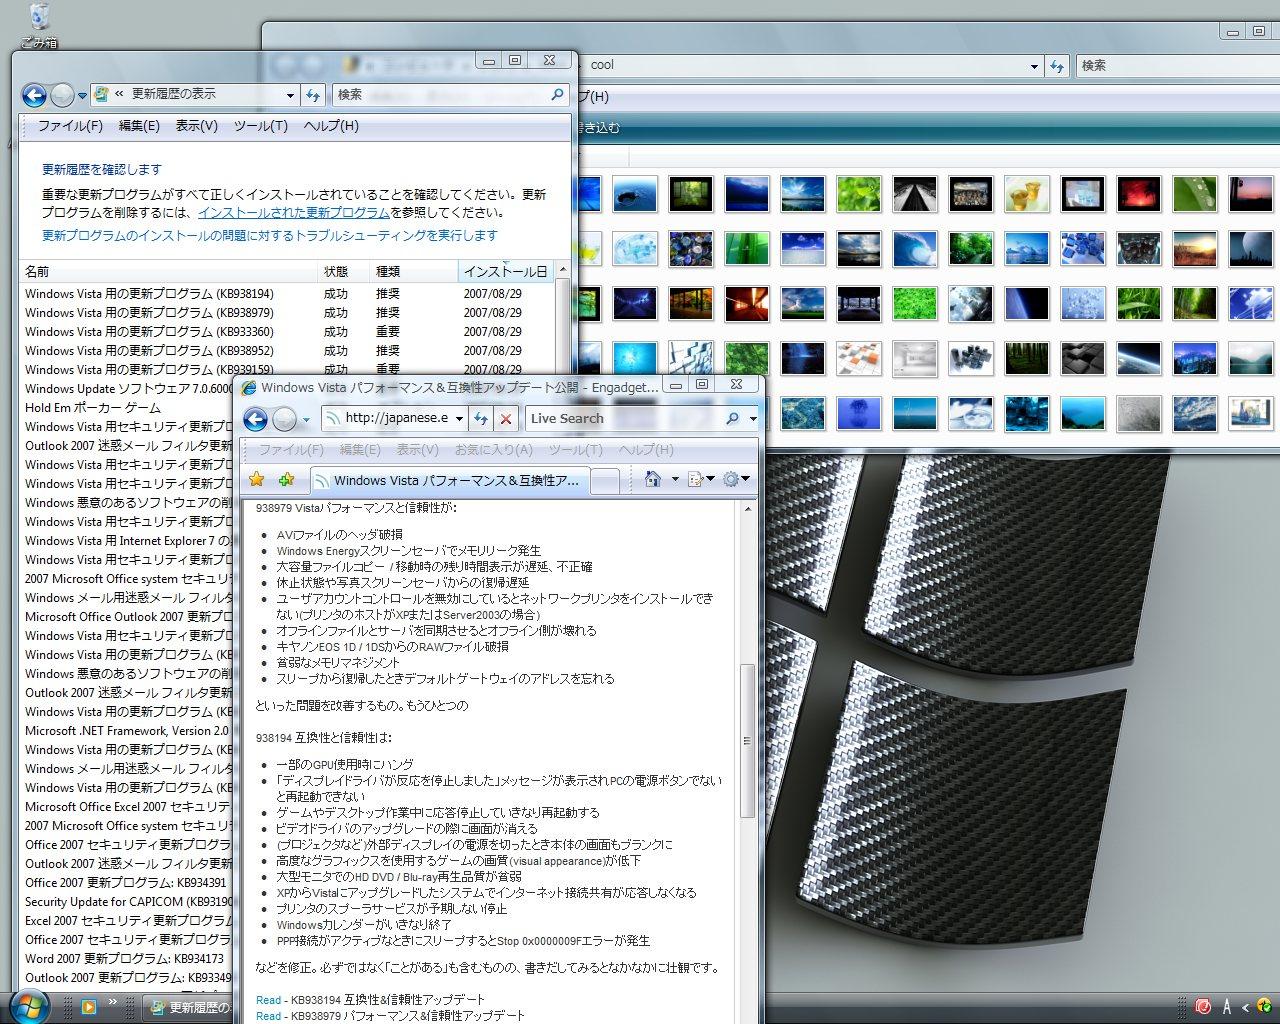 WindowsVistaのアップデート